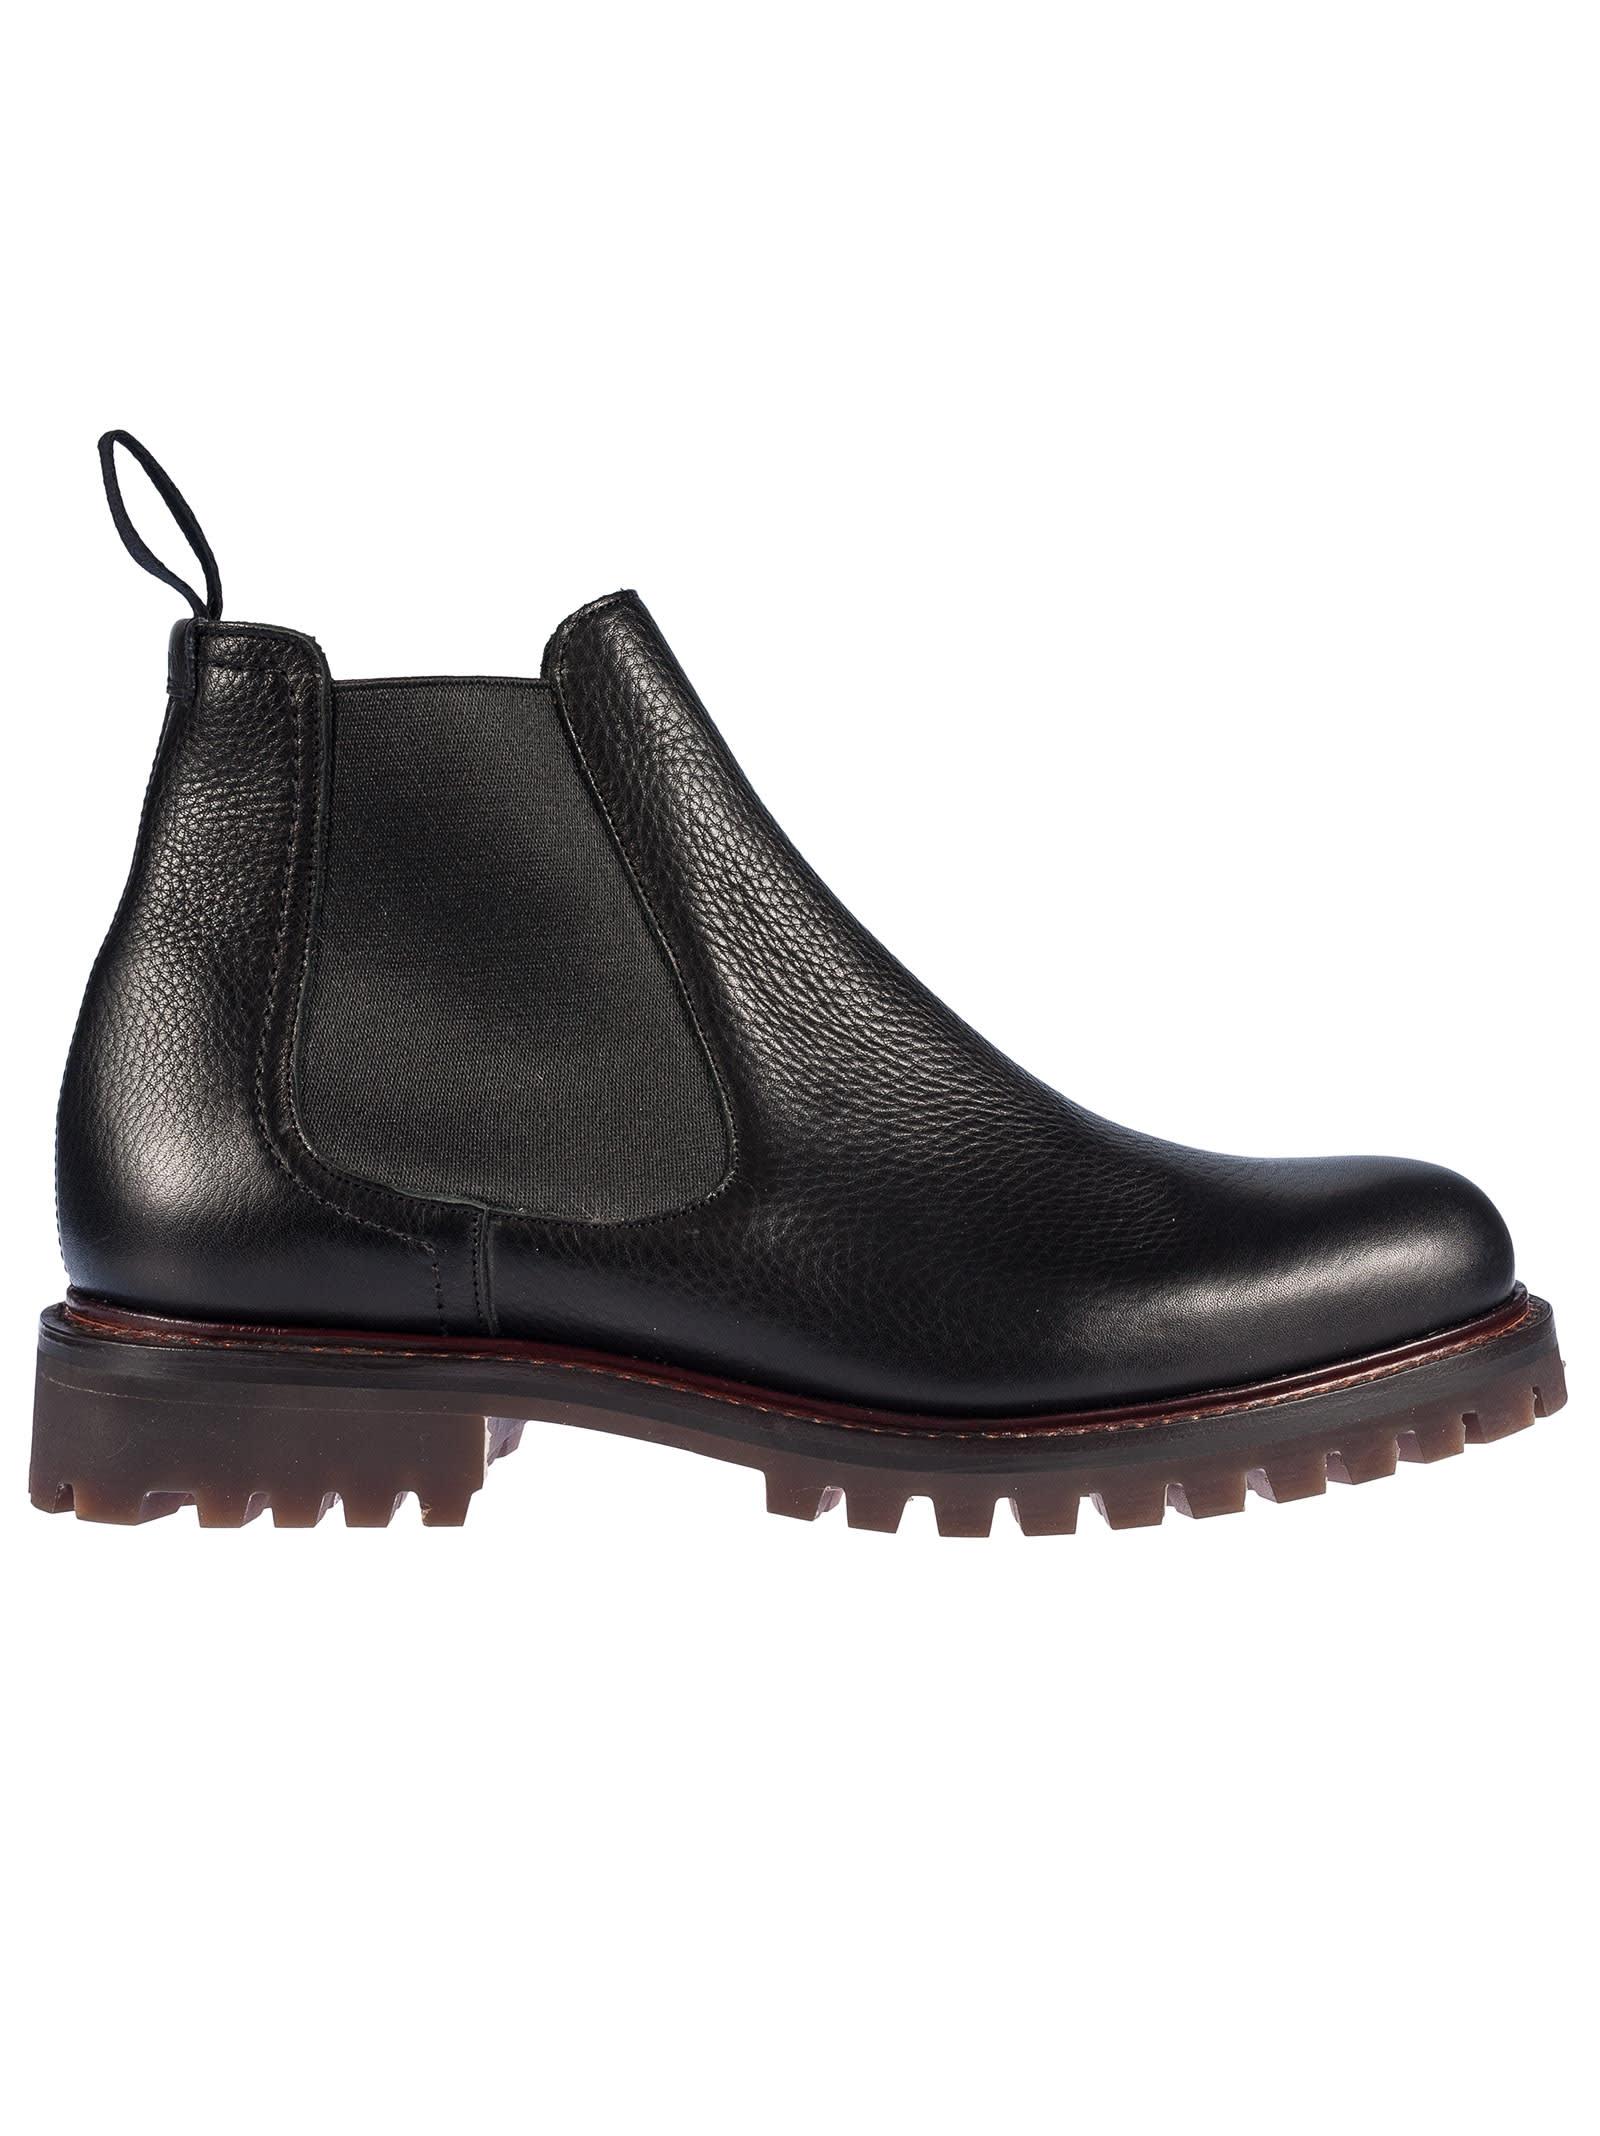 Churchs Cornwood Boots